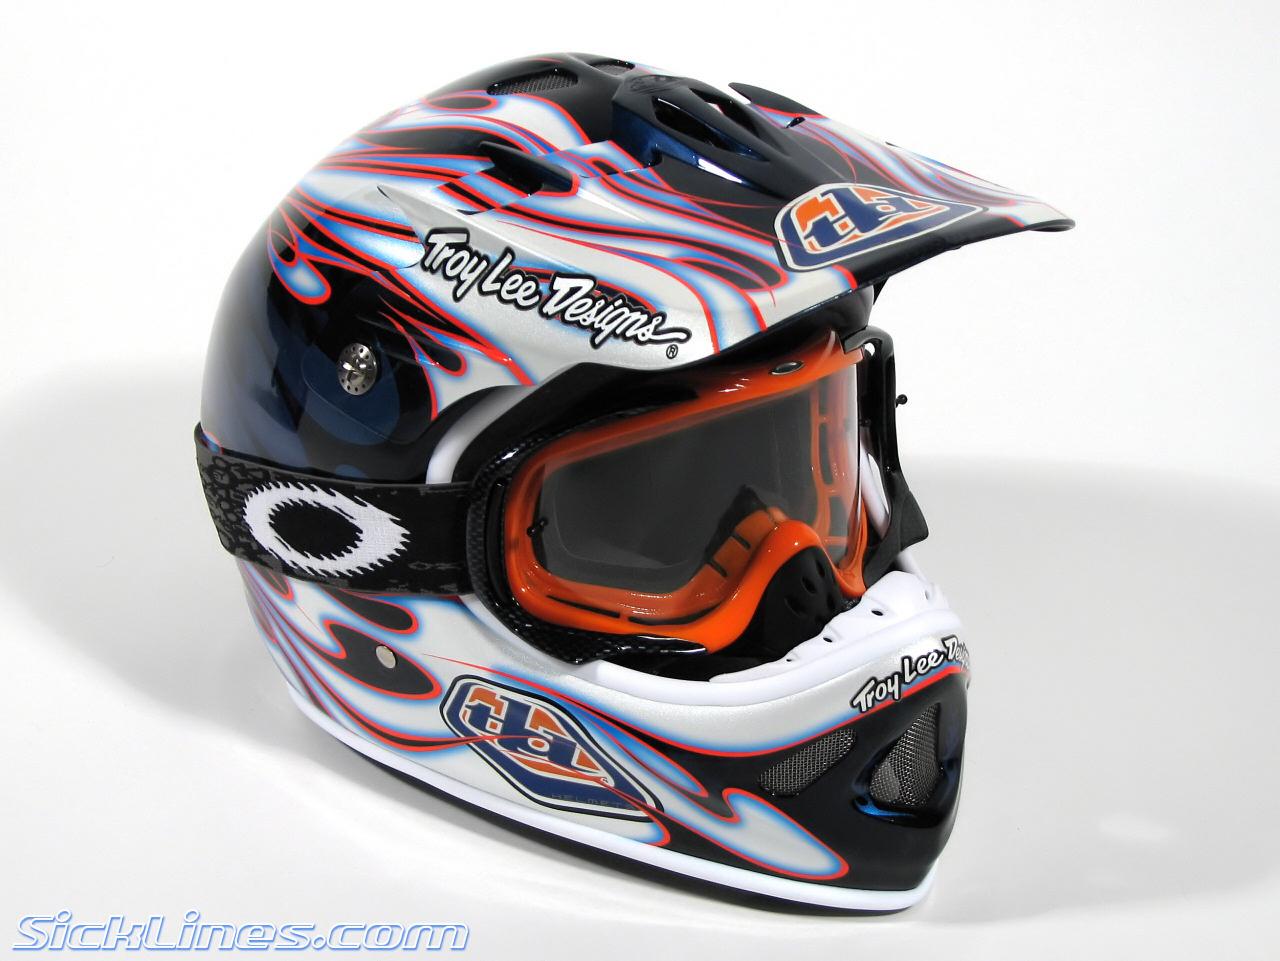 Oakley Airbrake Mx >> » 2007 Troy Lee Designs D2 Carbon Flame Helmet - Sick ...